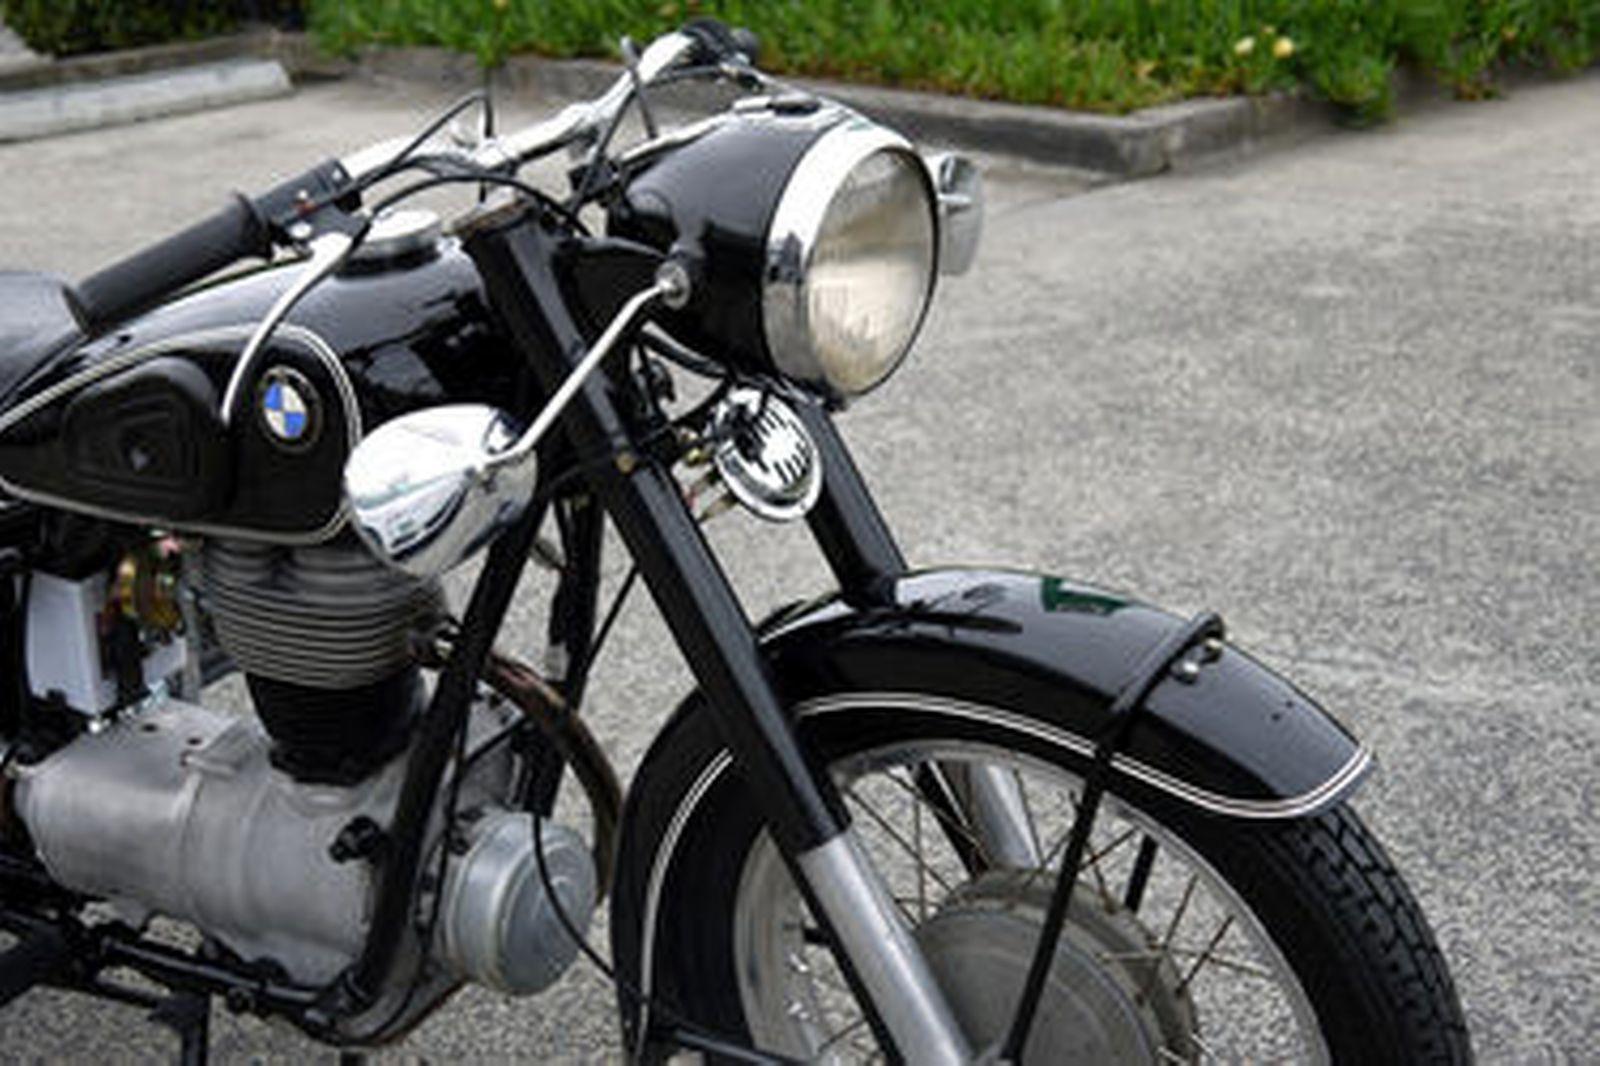 BMW R25/3 250cc Motorcycle